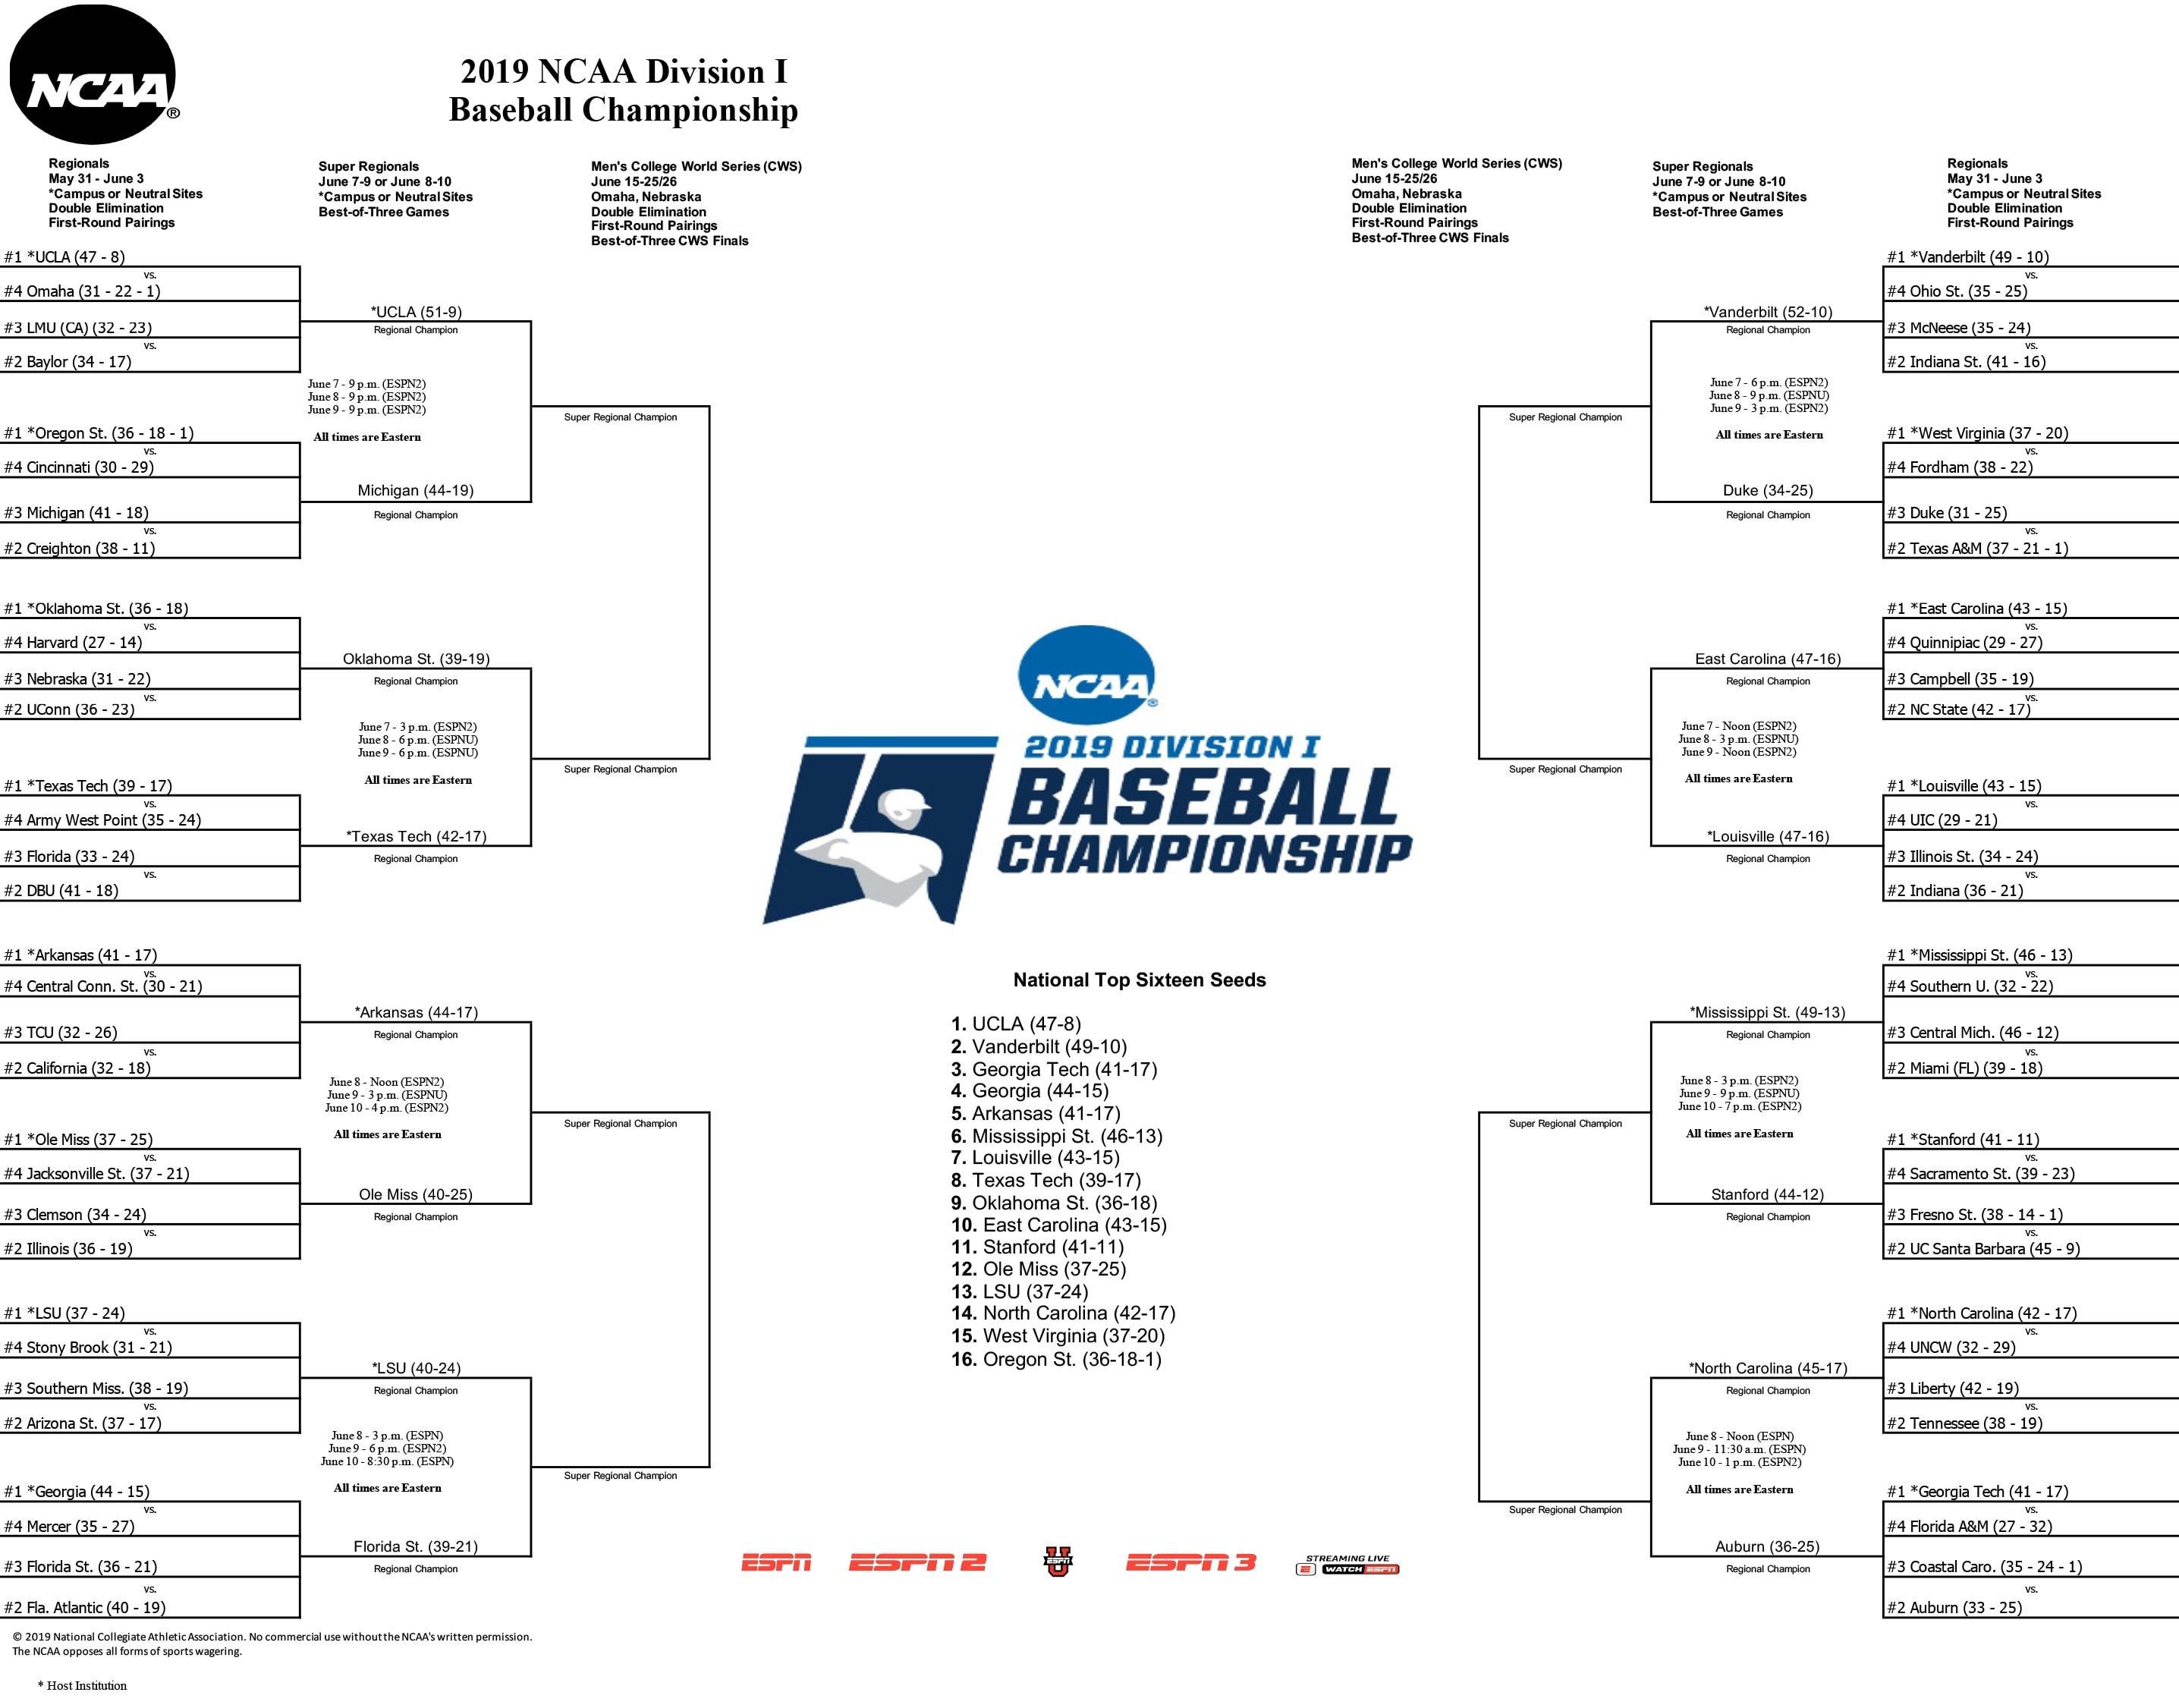 2019 NCAA Division I Baseball Tournament